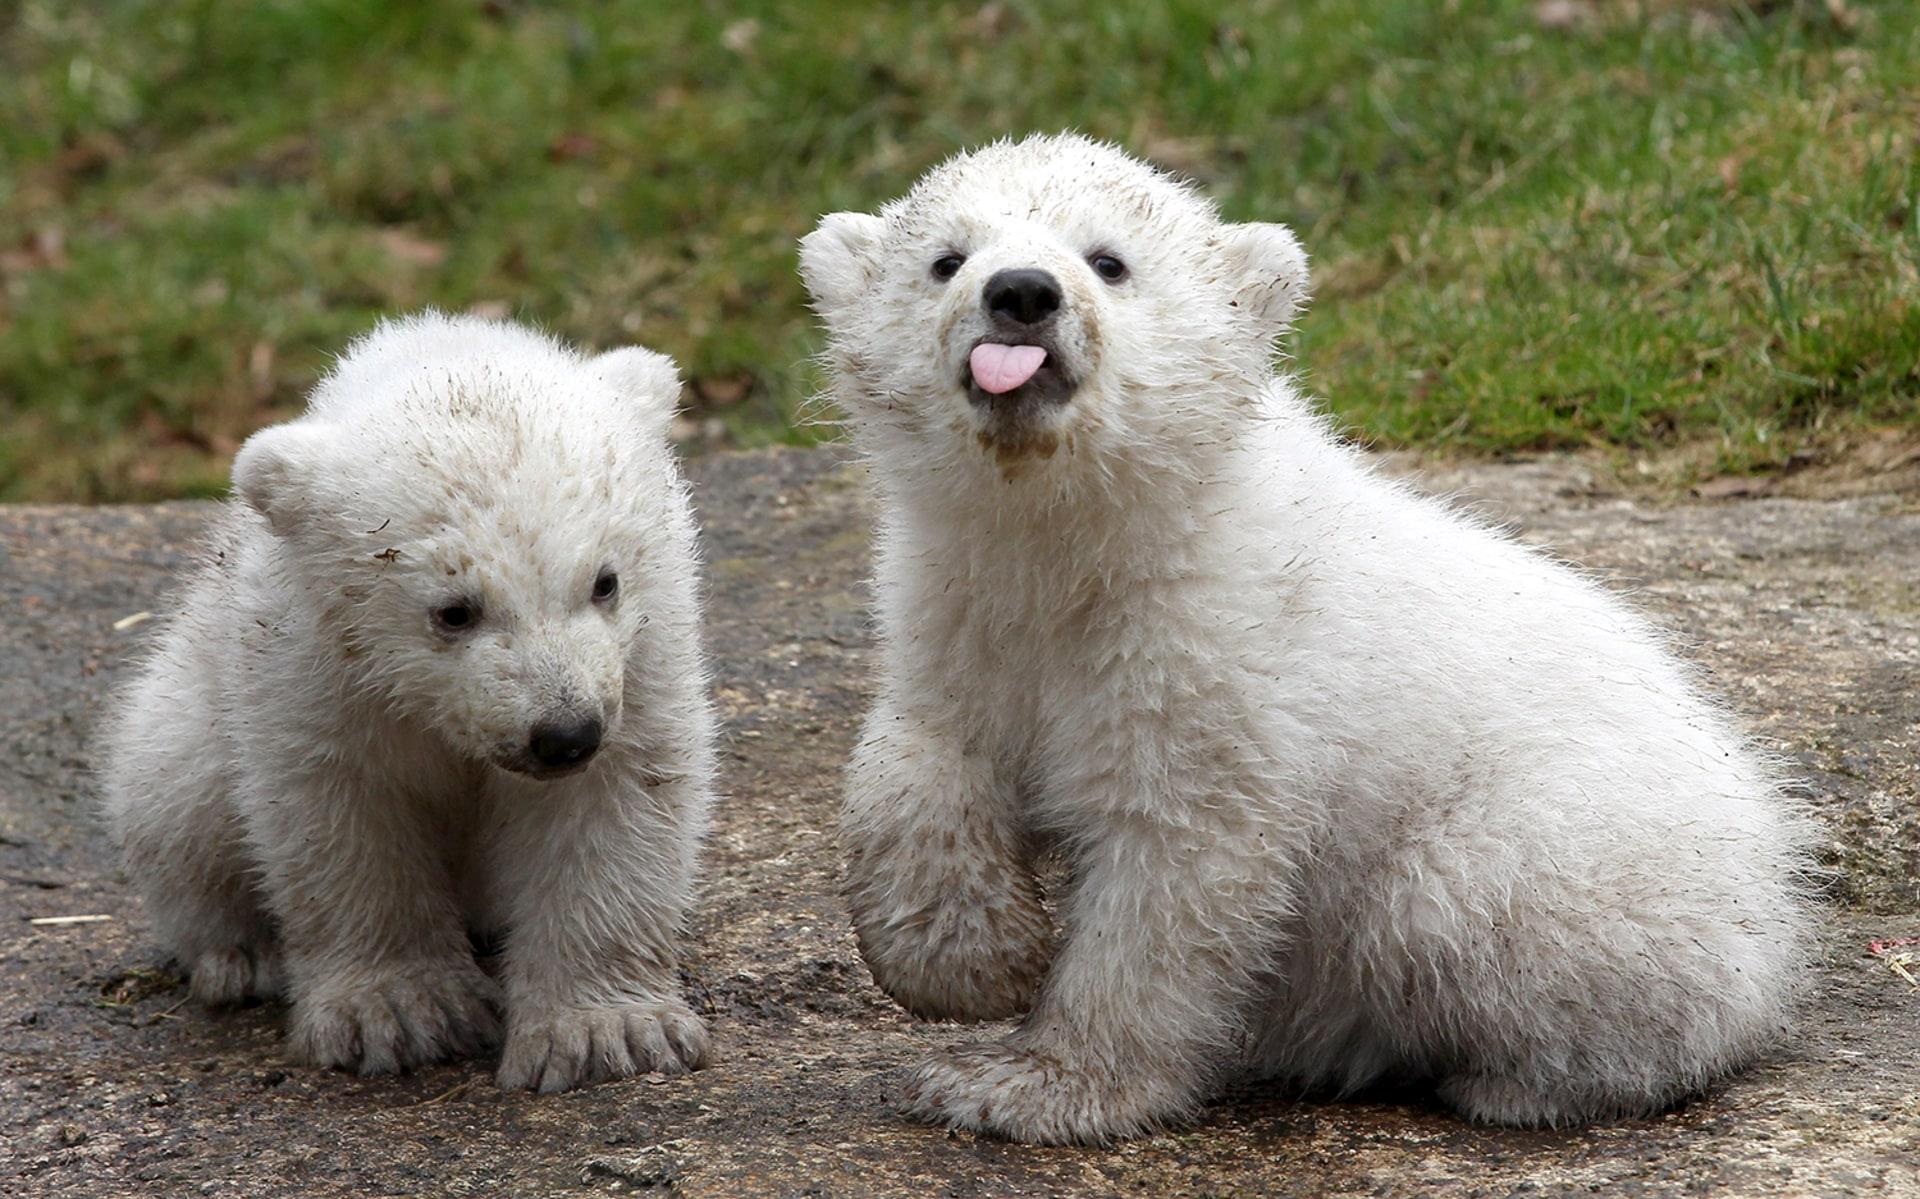 Baby animals photos baby animals ny daily news - Image Bestpix Munich Zoo Presents Twin Polar Bear Cubs